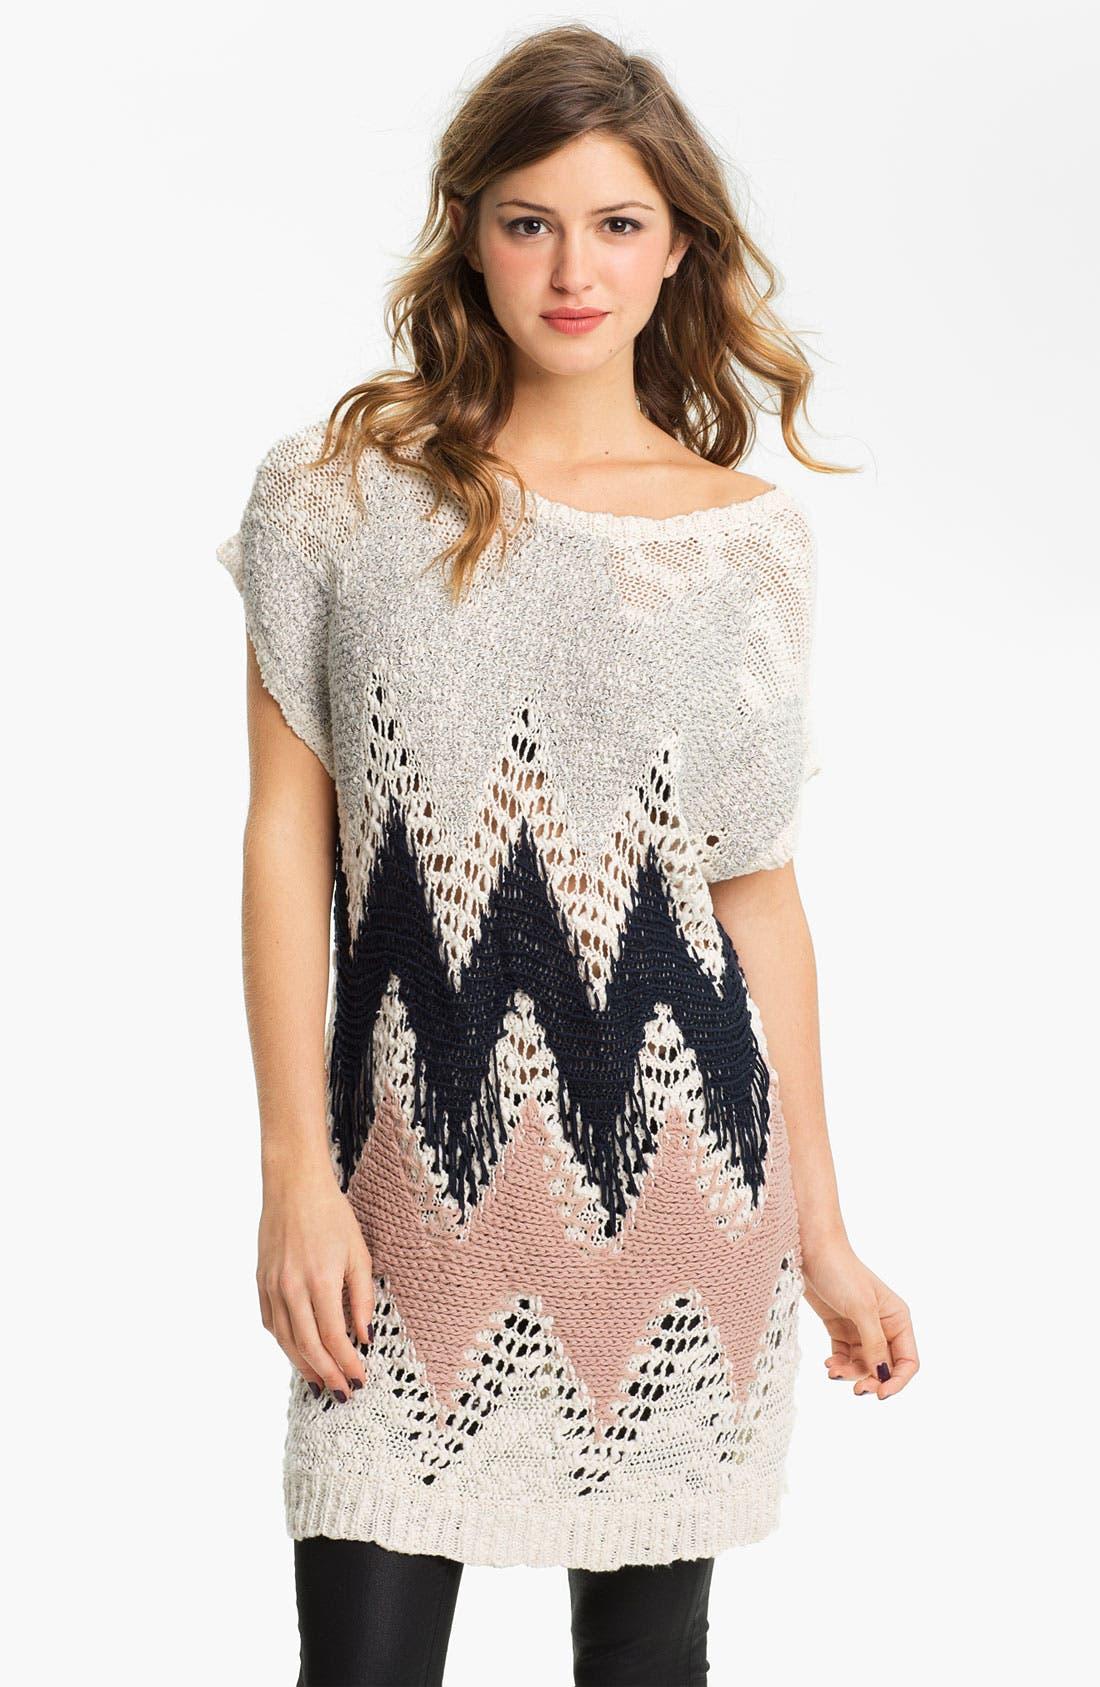 Main Image - Love by Design Zigzag Crochet Tunic Sweater (Juniors)